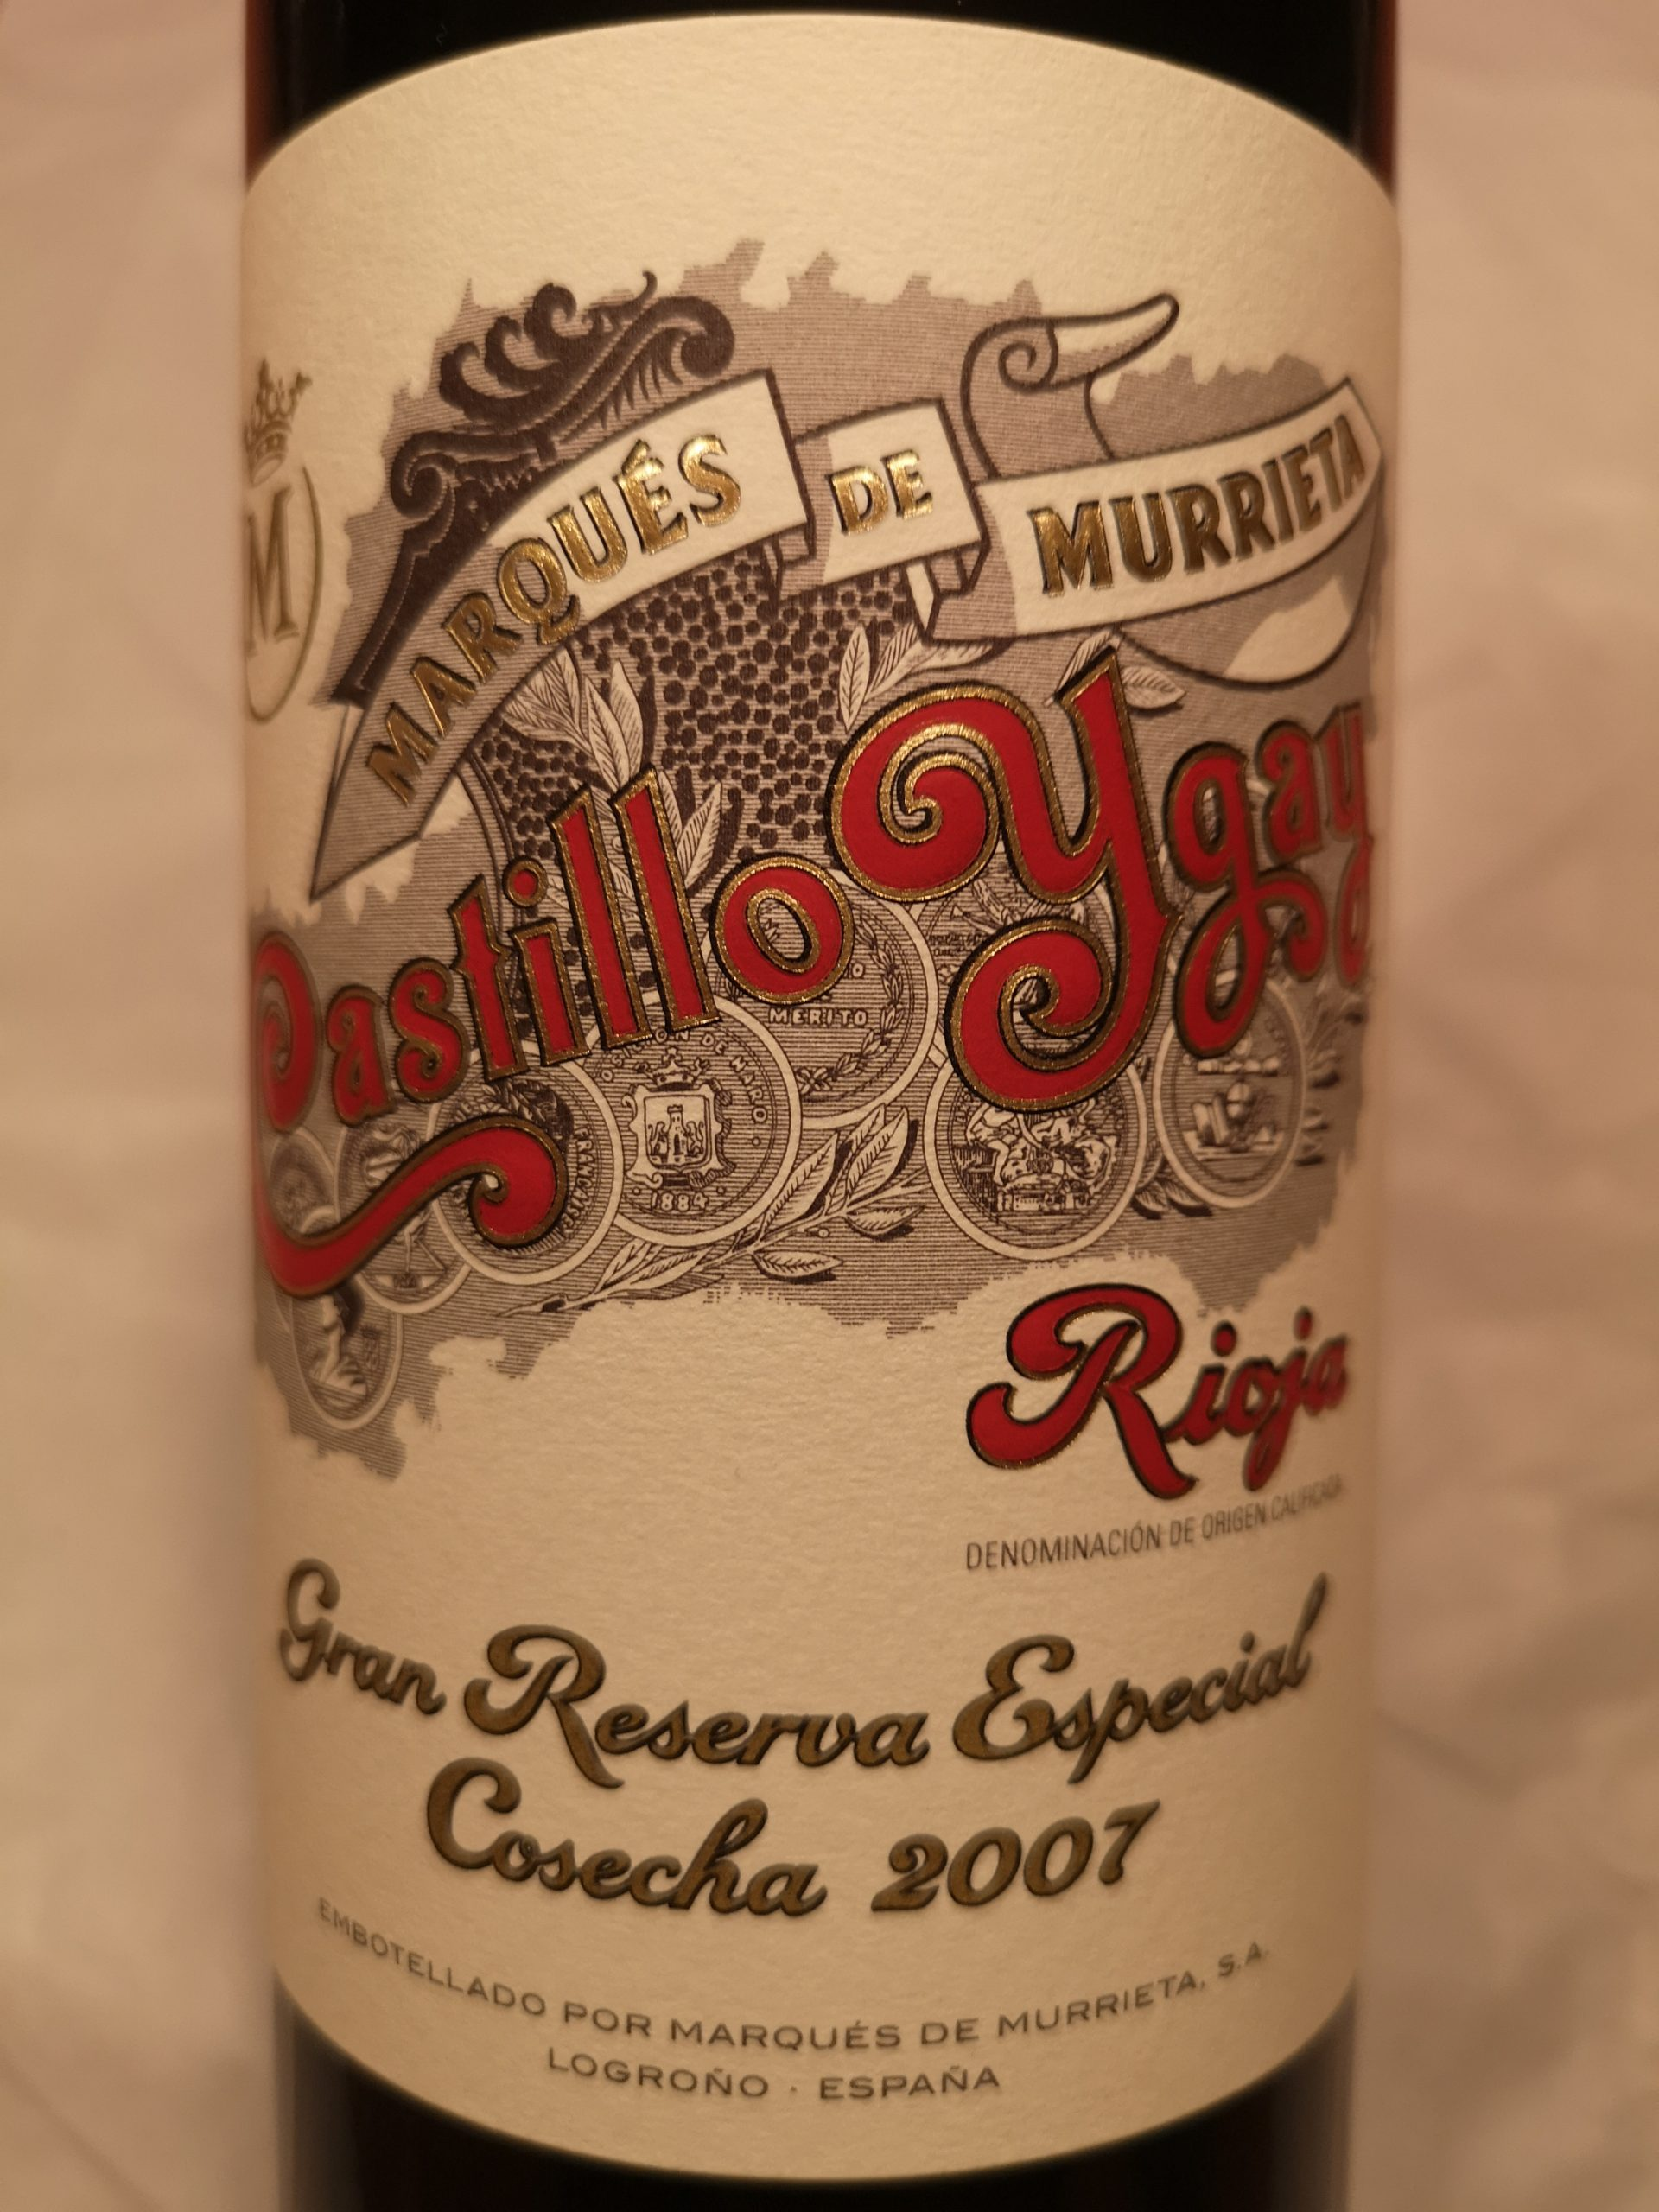 2007 Castillo Ygay Gran Reserva Especial | Marqués de Murrieta